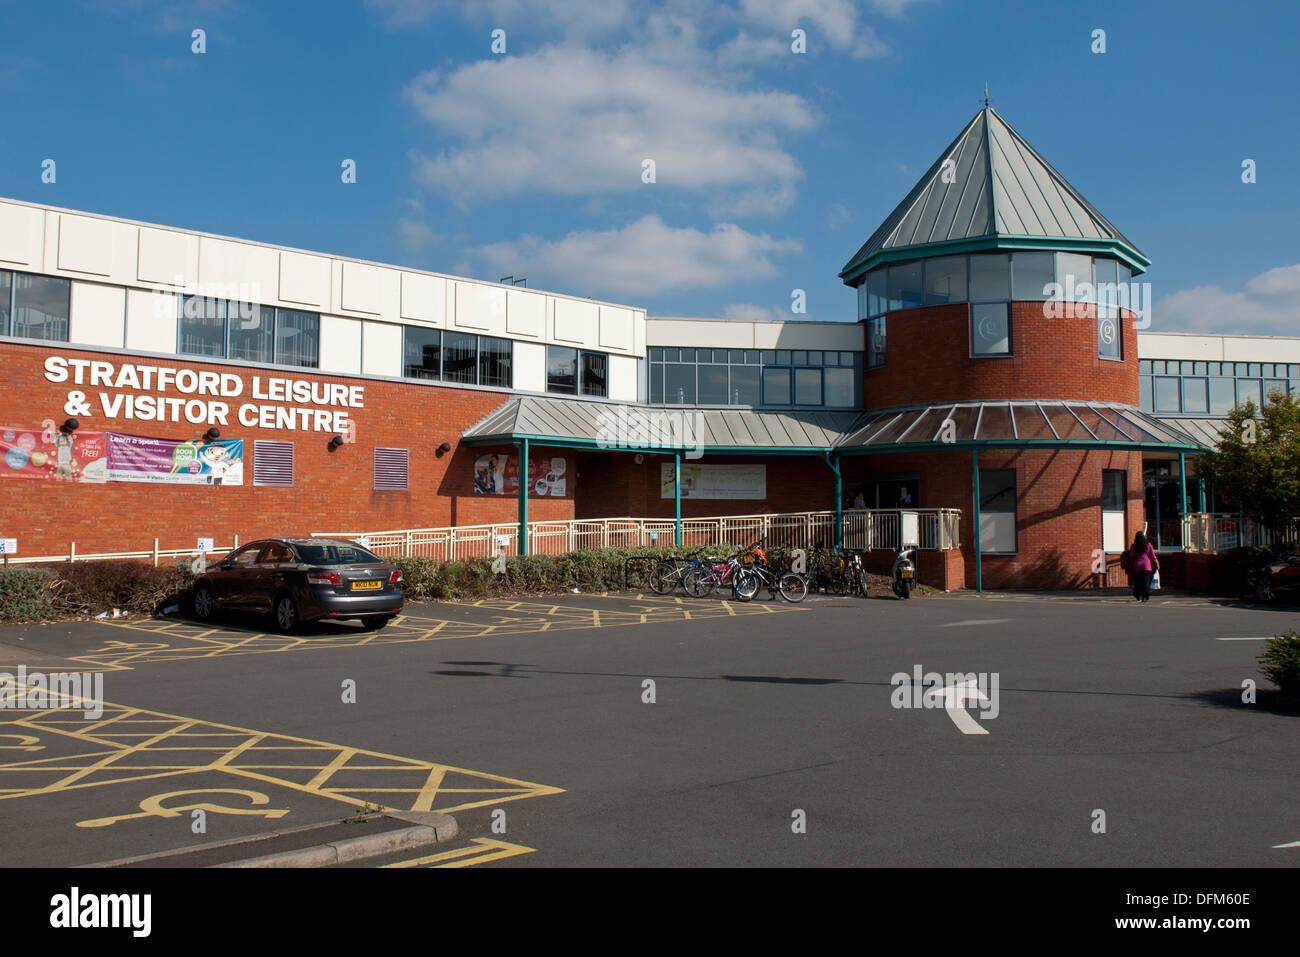 Stratford Leisure Centre Stratford Upon Avon Uk Stock Photos Stratford Leisure Centre